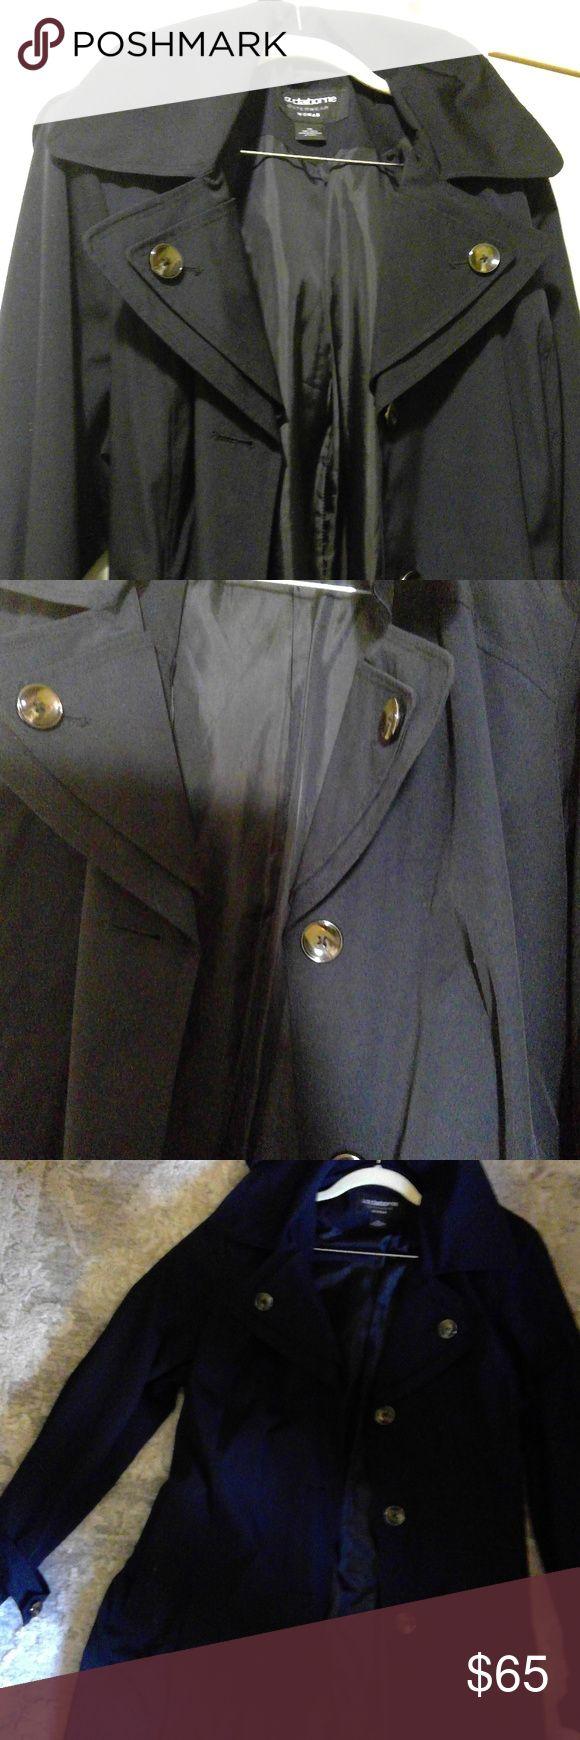 Liz Claiborne Outerwear Women Trench Coat Trench Coats Women Outerwear Women Black Outerwear [ 1740 x 580 Pixel ]